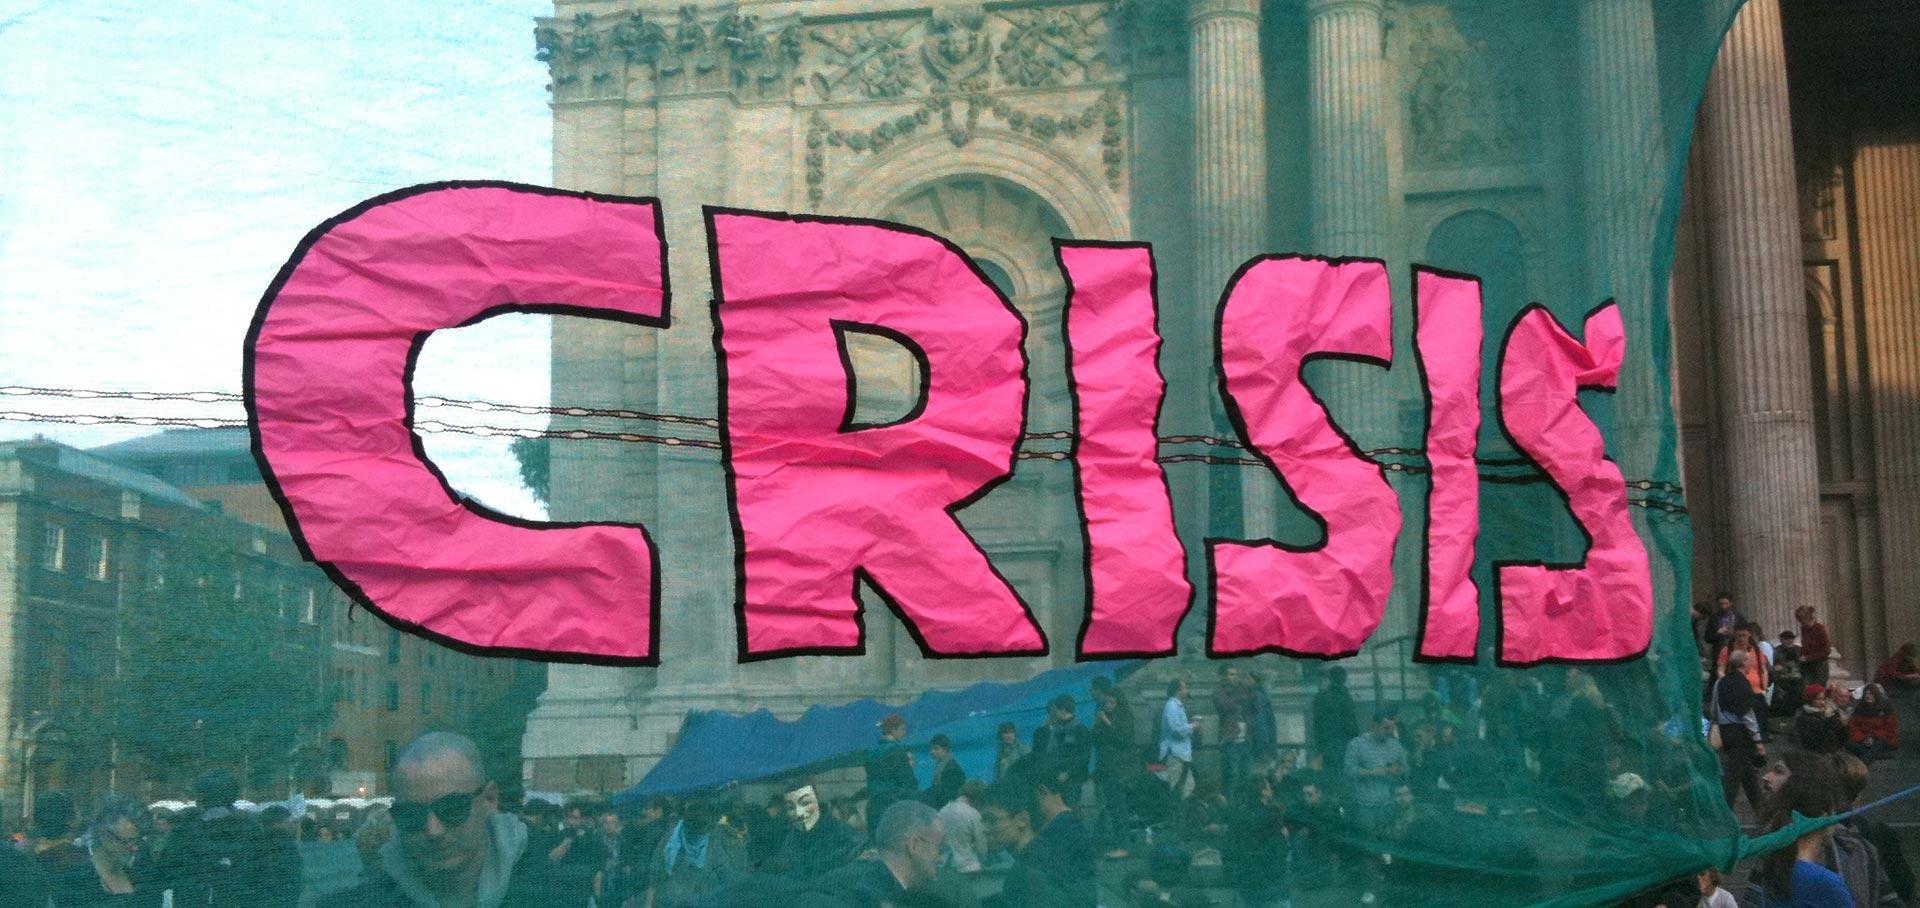 Transparent mit der Aufschrift (Poster) »Crisis«